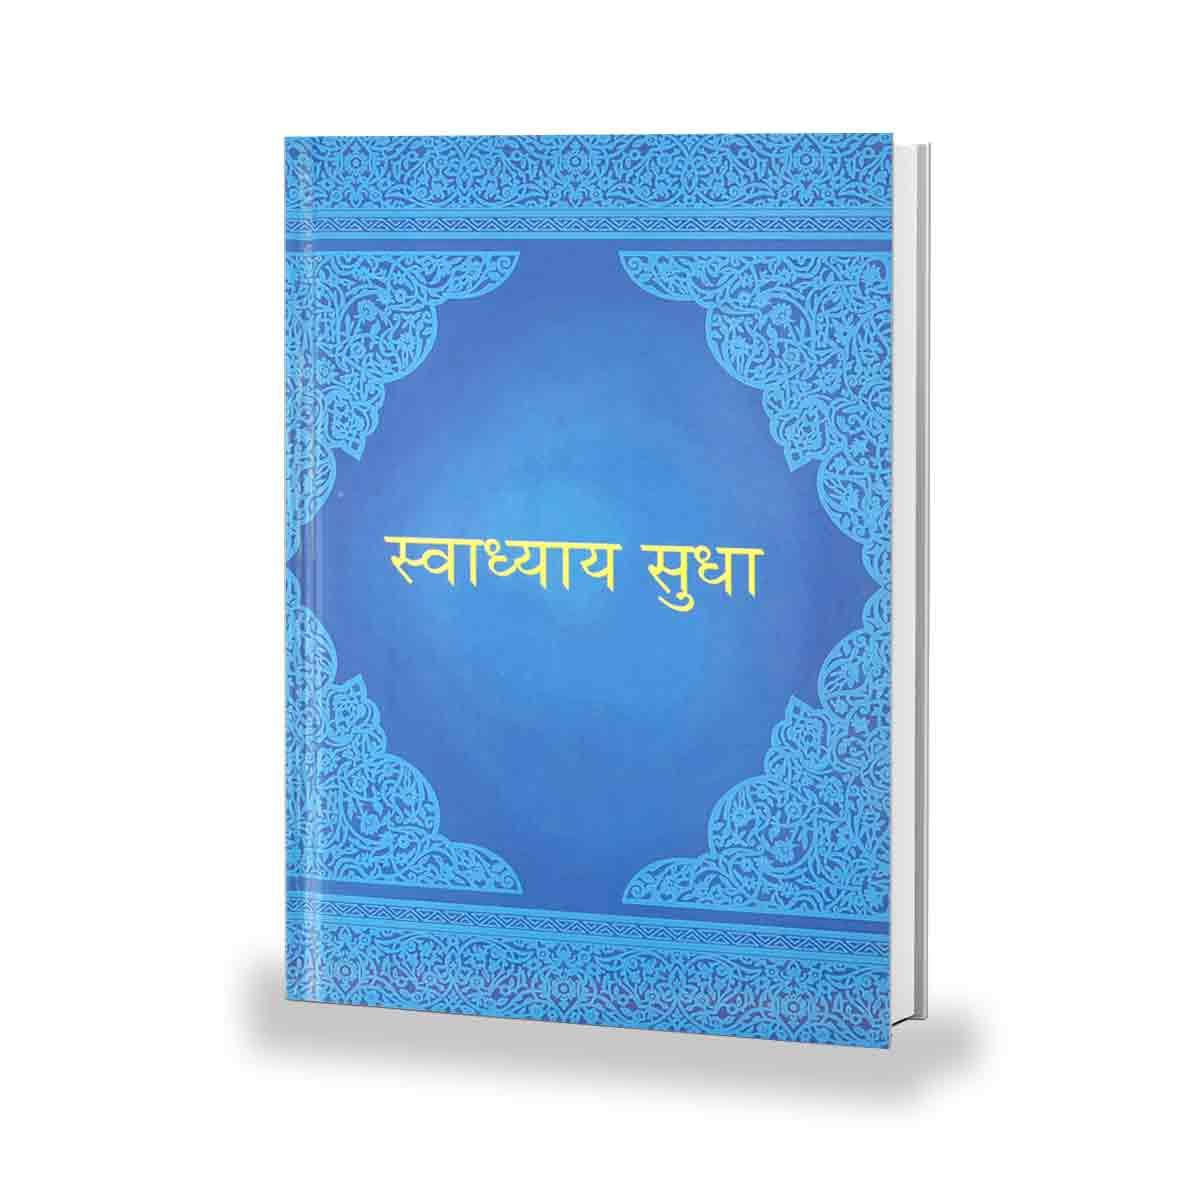 HINDI-SWADHYAYA SUDHA